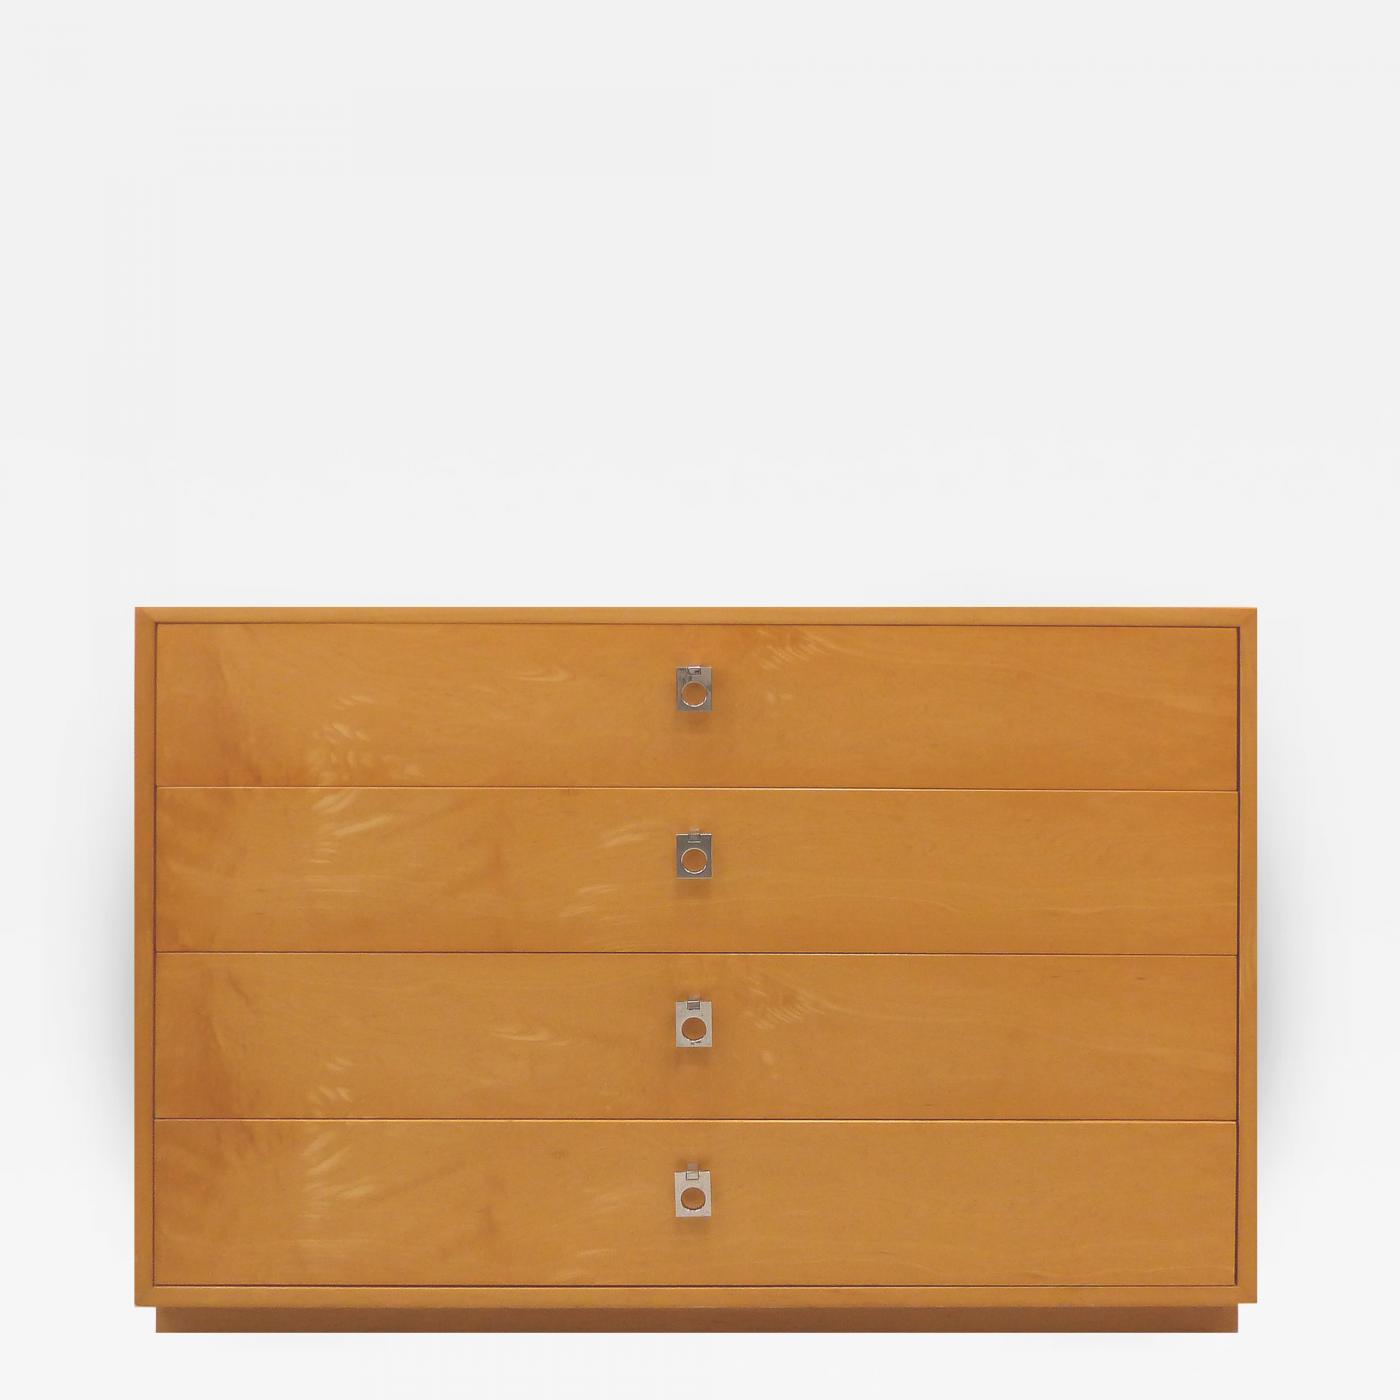 Attirant Listings / Furniture / Case Pieces U0026 Storage / Chests U0026 Commodes · Jack  Cartwright ...